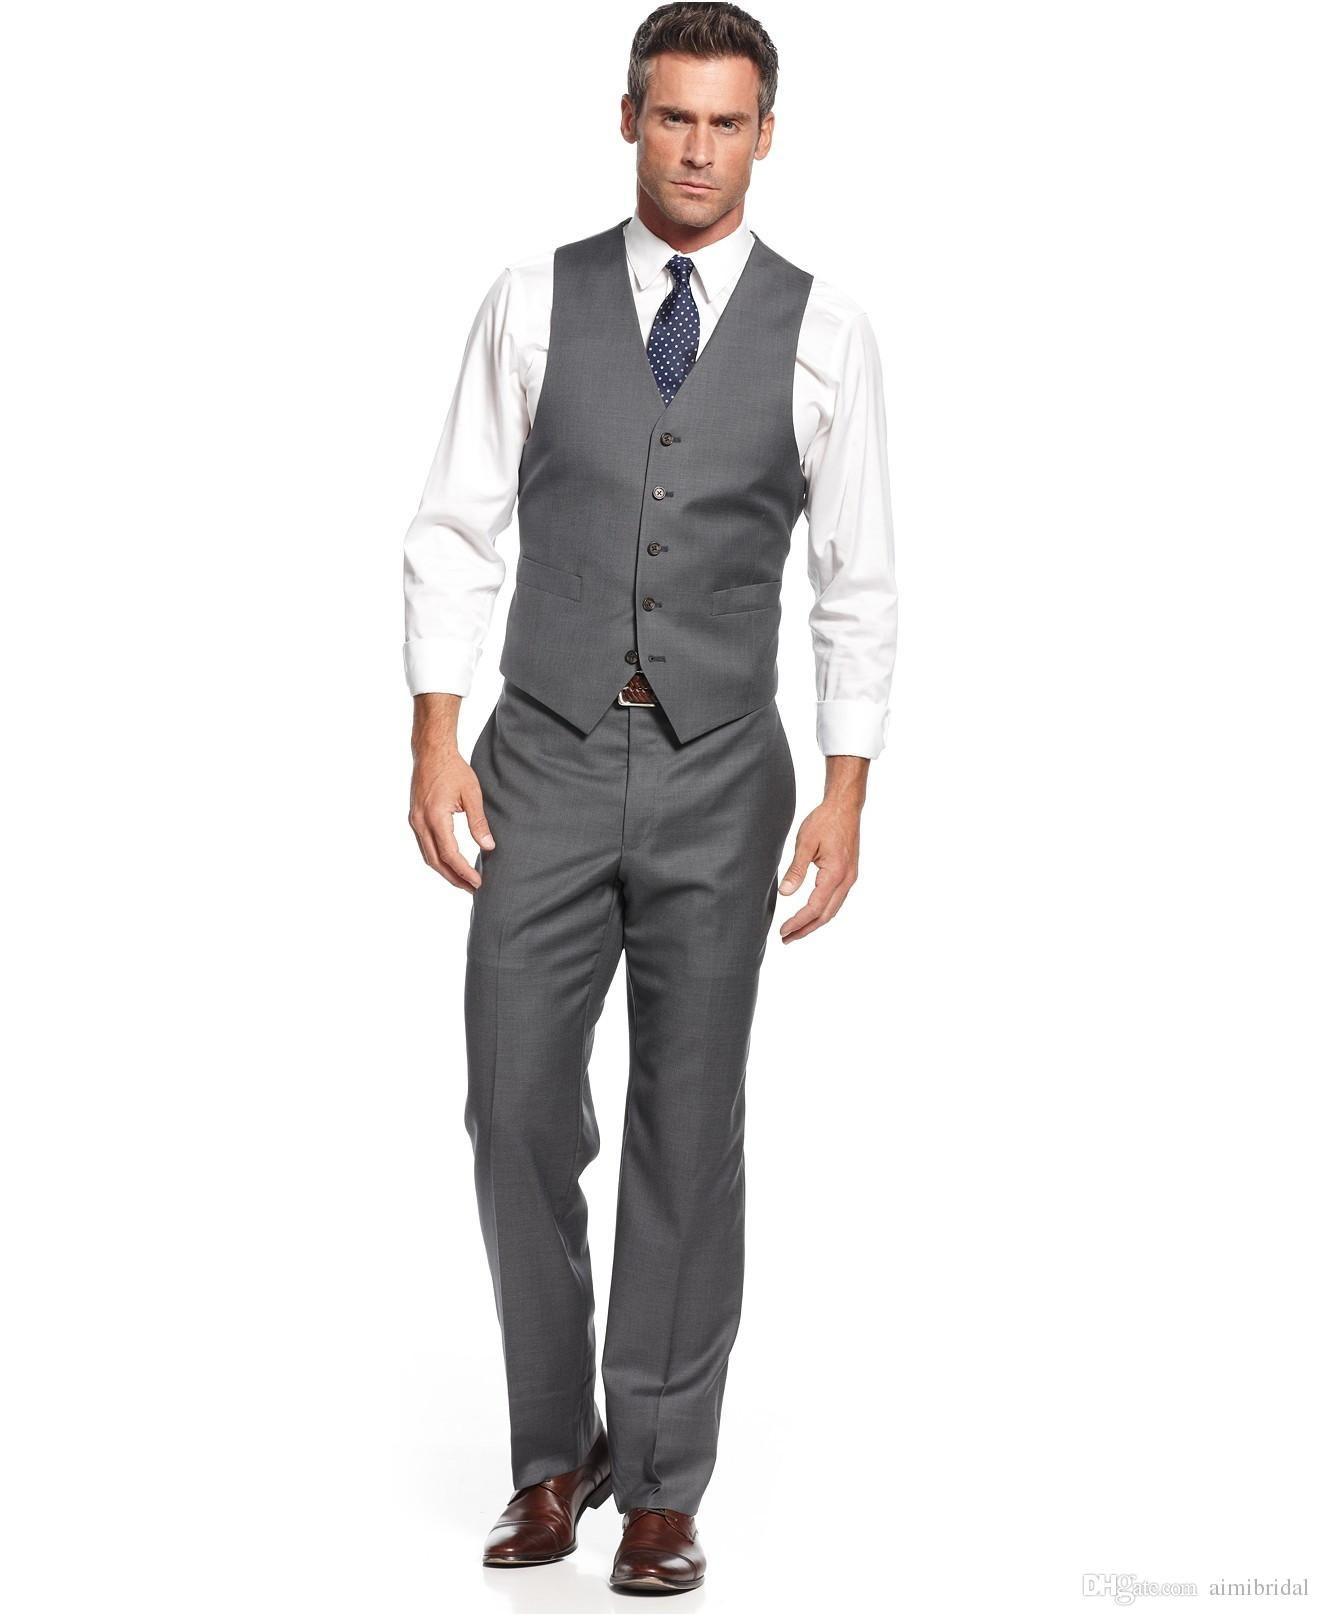 2016 New Custom Made Men Suits Dark Grey Tuxedos For Wedding Best Men Slim Fit Three Pieces Groom Groomsmen Tuxedos Jacket Pants Waistcoat Suits For Wedding Groom Tux For Wedding From Aimibridal, $78.33| Dhgate.Com